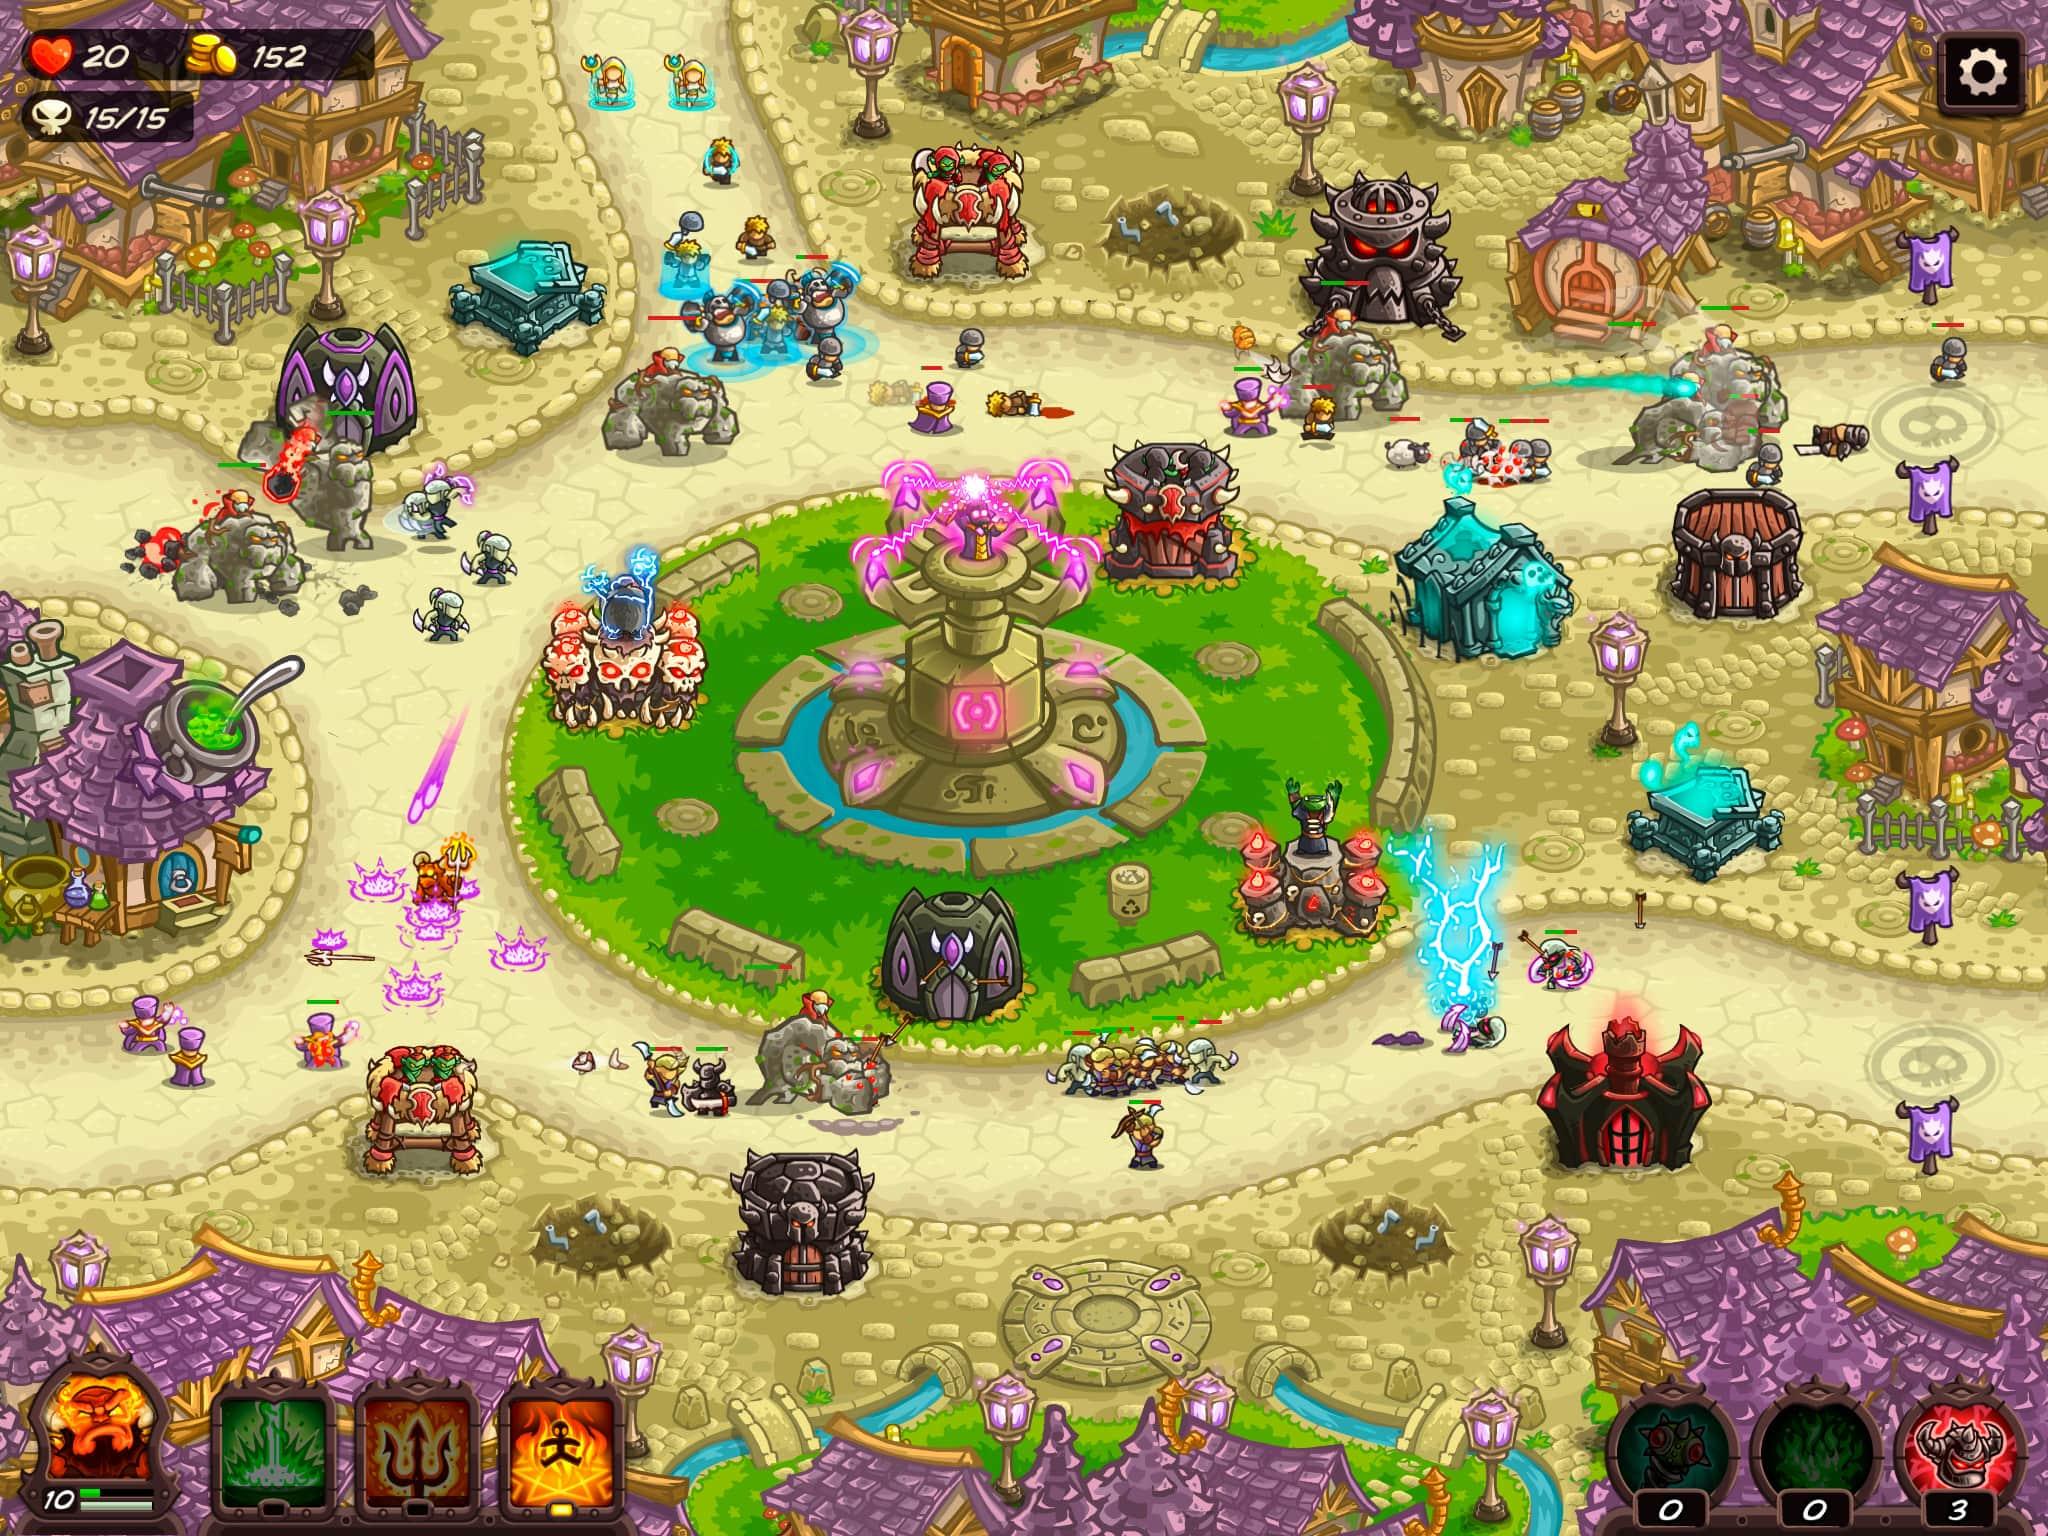 kingdom_rush_vengeance_screenshot04_full (1)